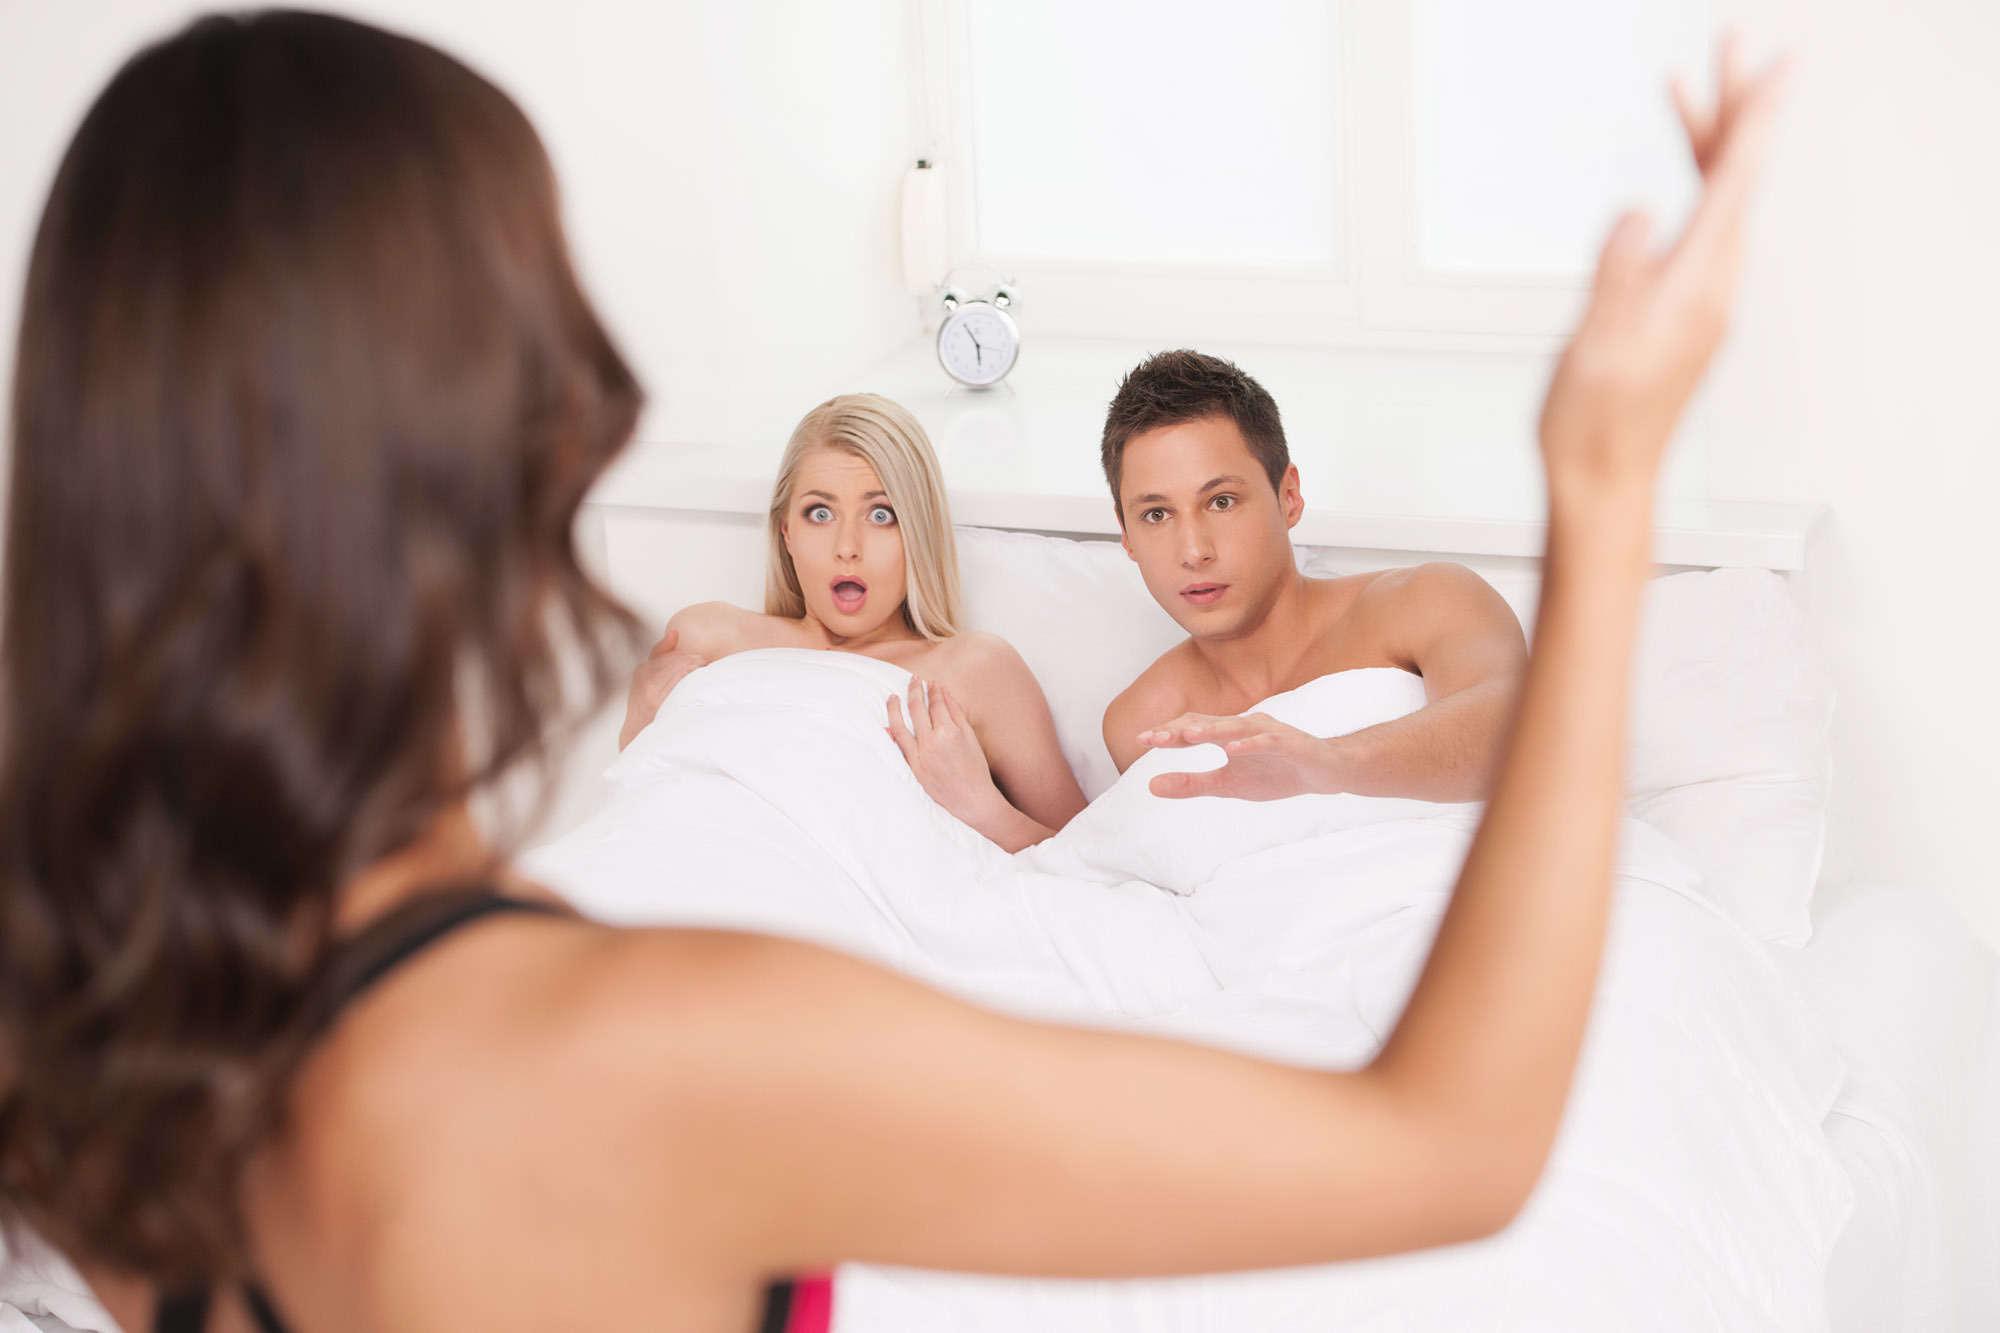 Menurut Psikolog, 3 Penyebab Utama Pasangan Nekat Selingkuh